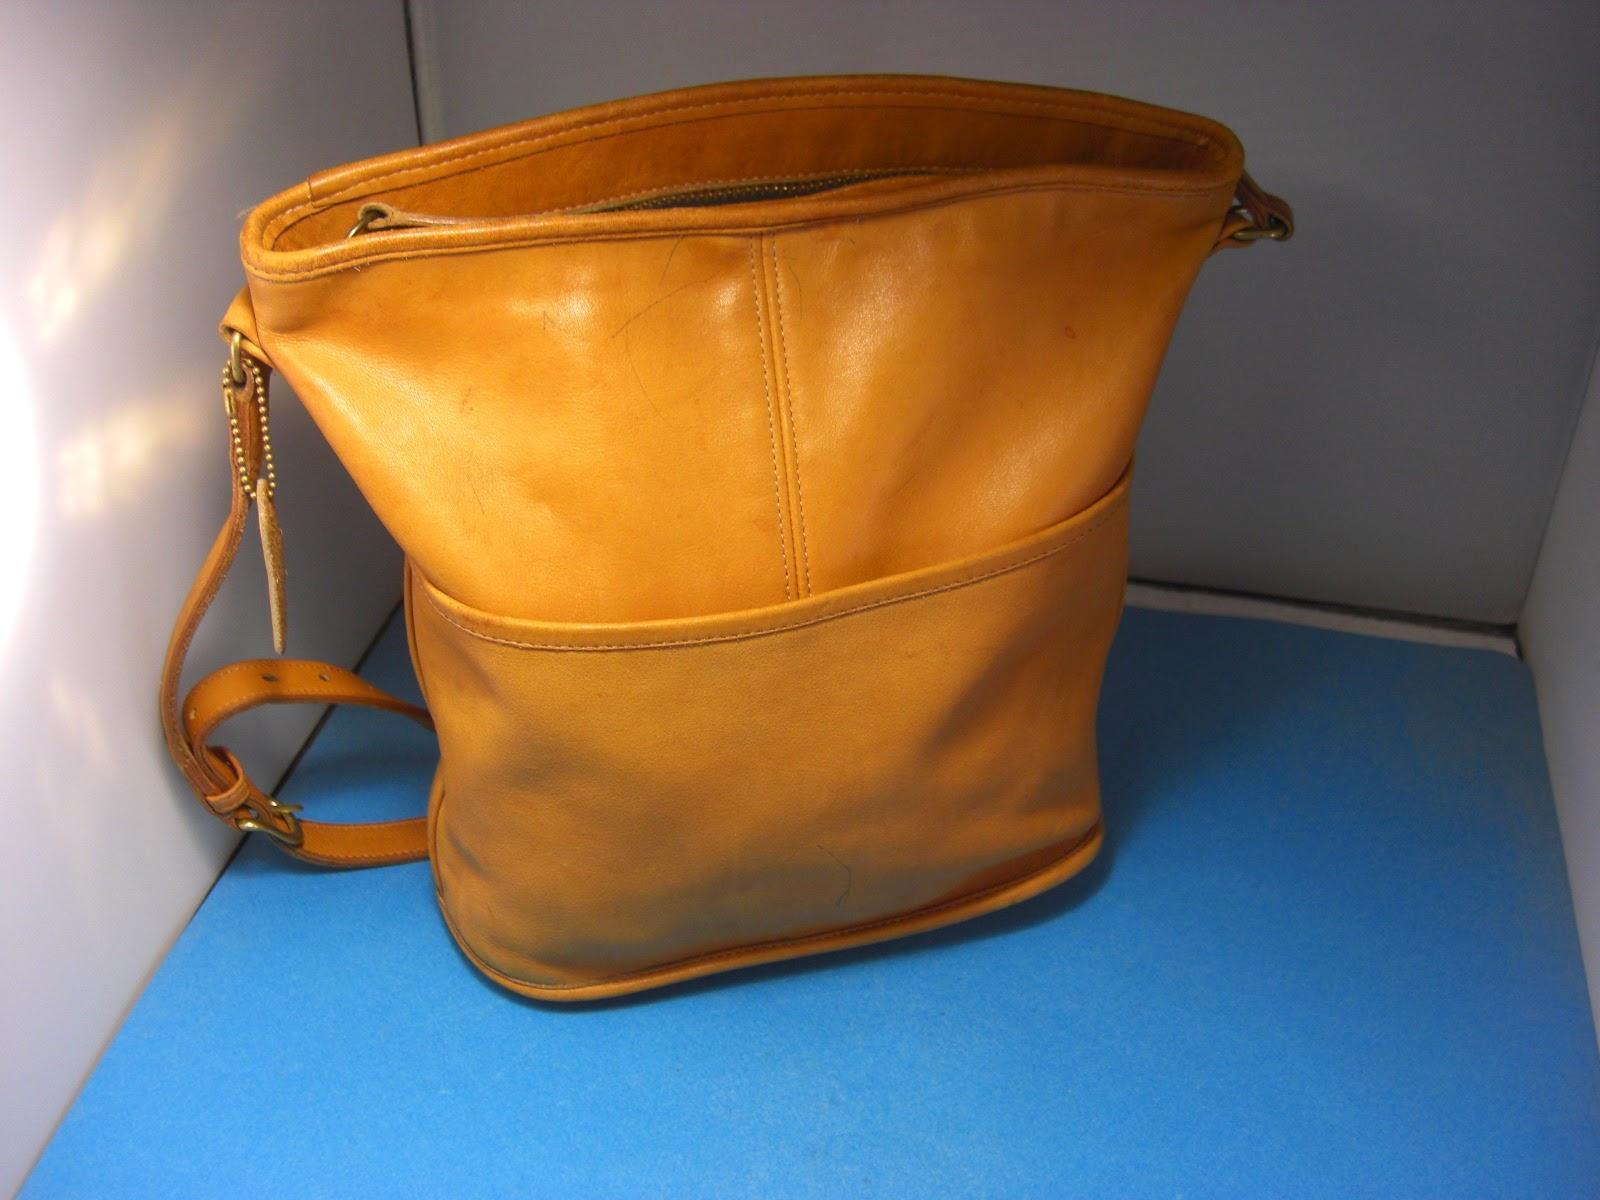 http://bargaincart.ecrater.com/p/22233074/authentic-coach-tan-leather-0245-013-crossbody